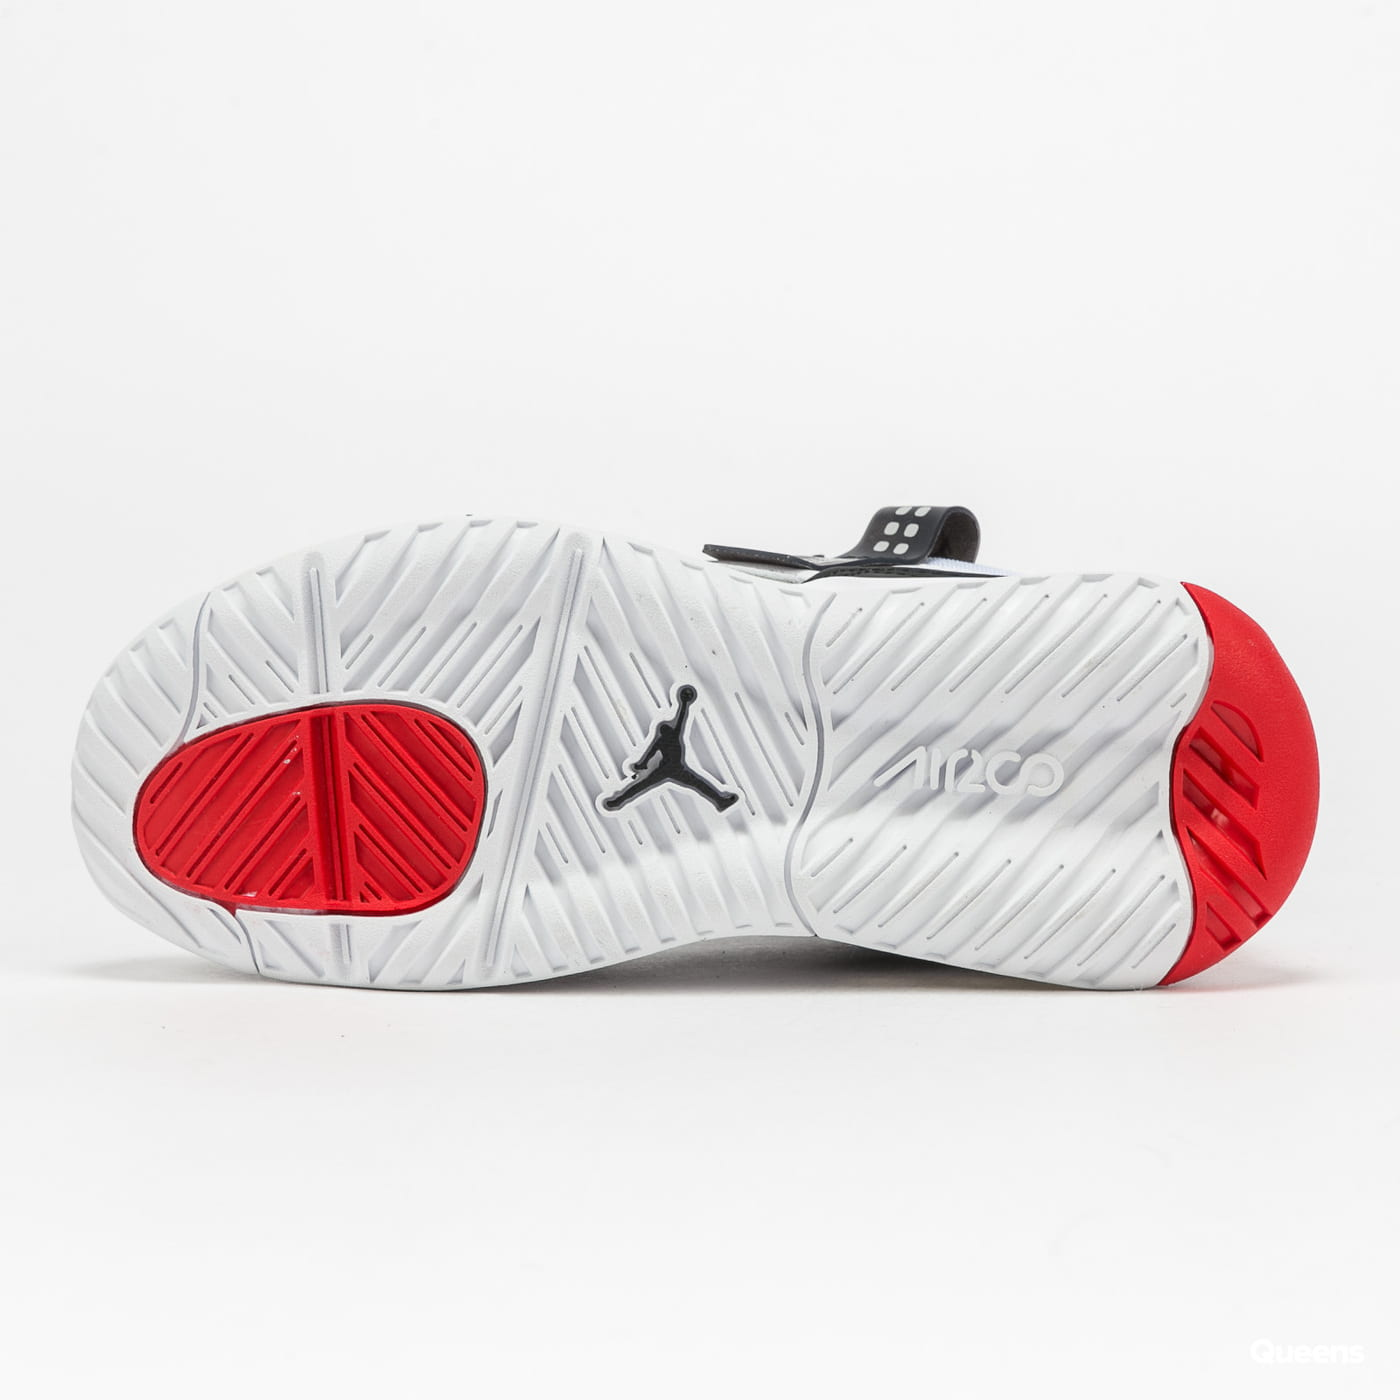 Jordan MA2 white / black - university red